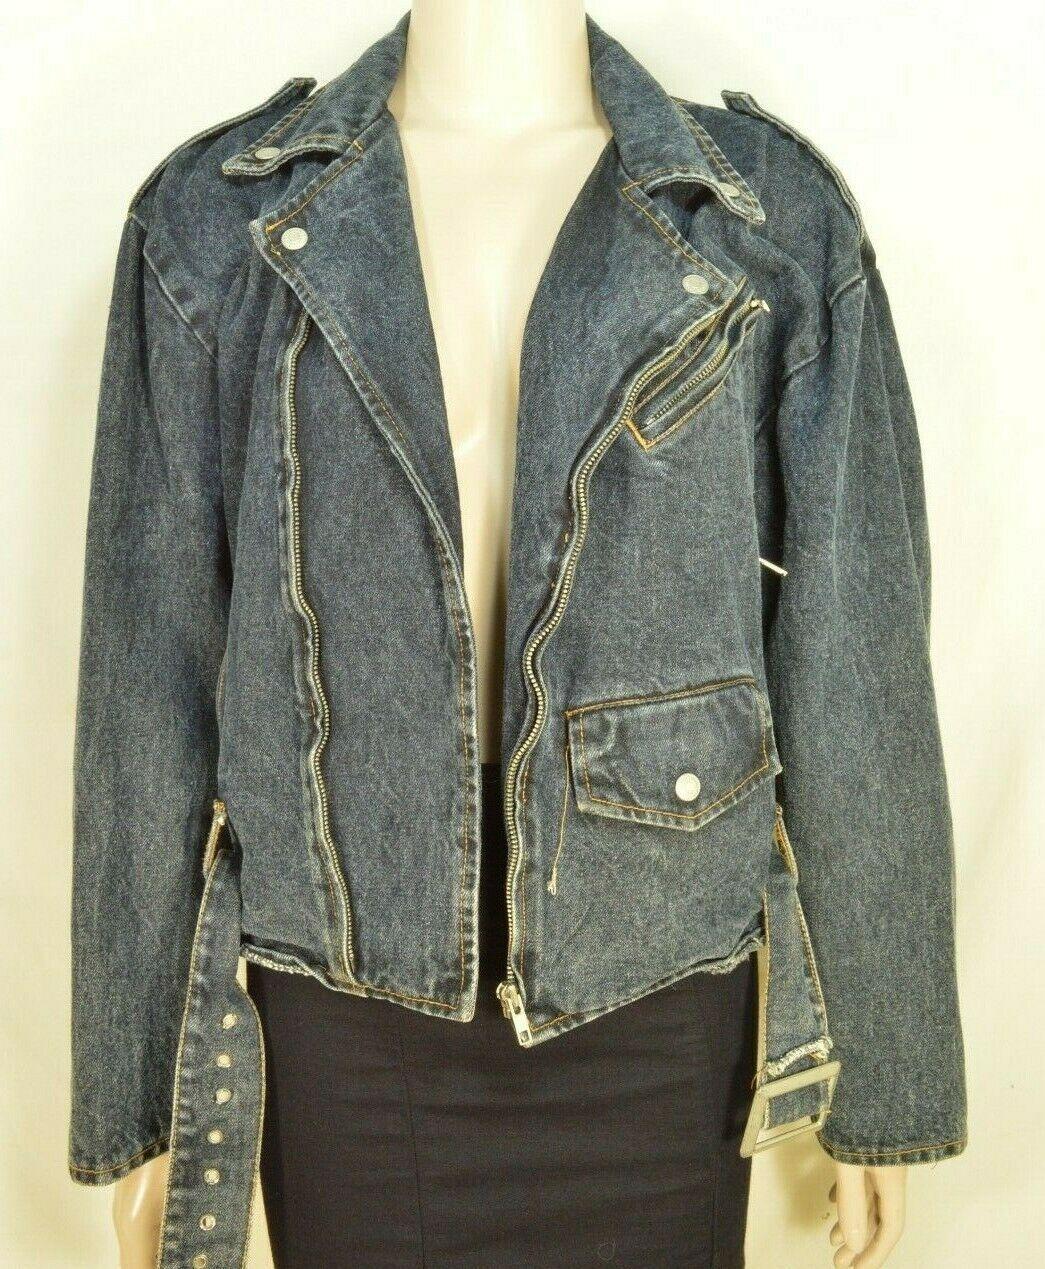 Jordache jeans jacket SZ M denim moto style vintage zippers pockets belt dark